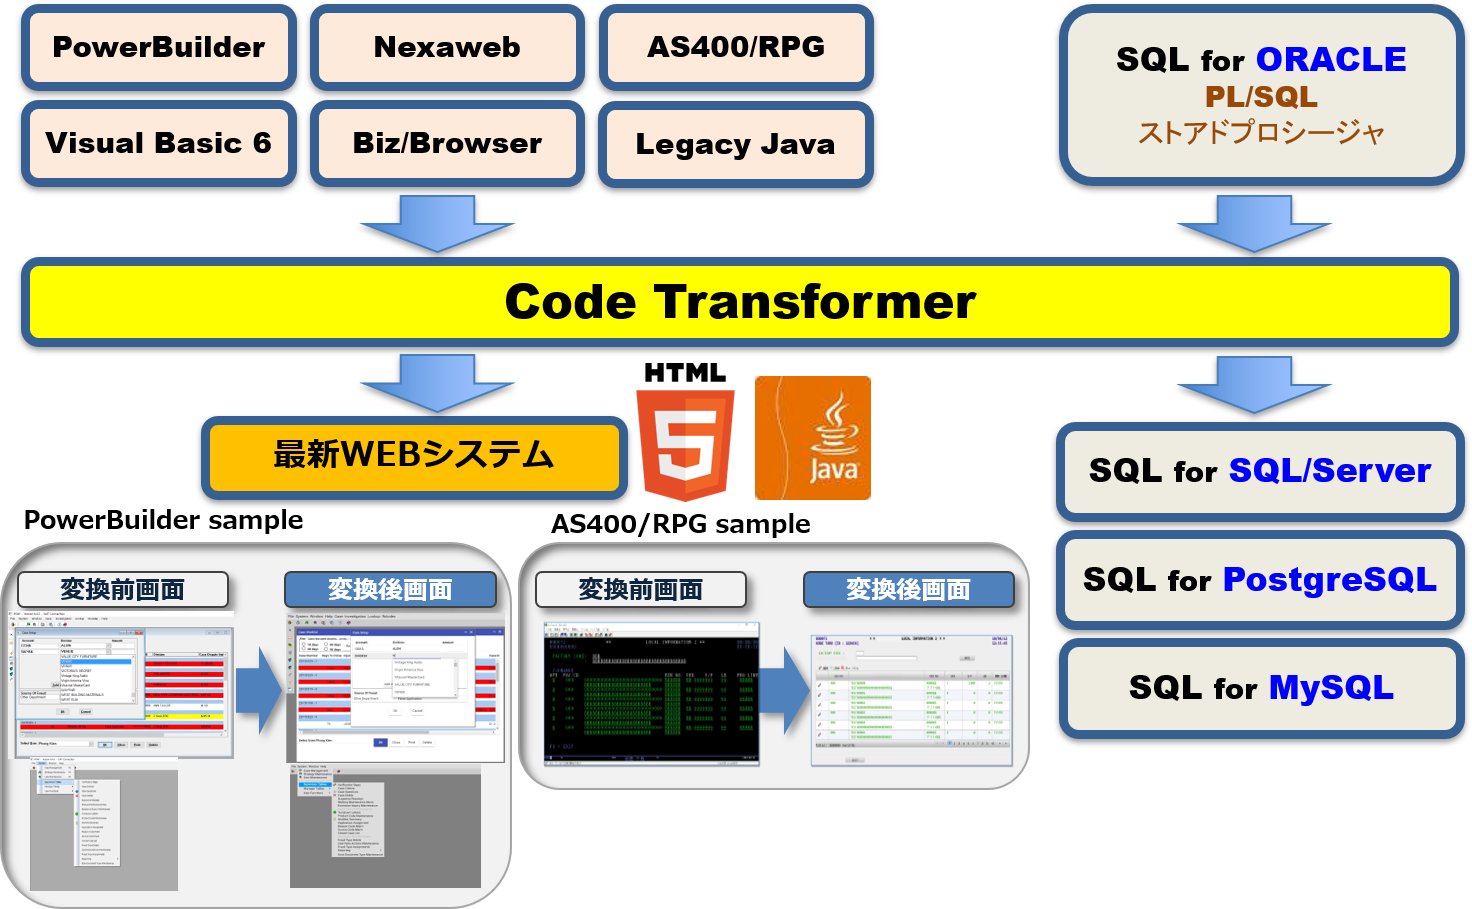 Code Transformer